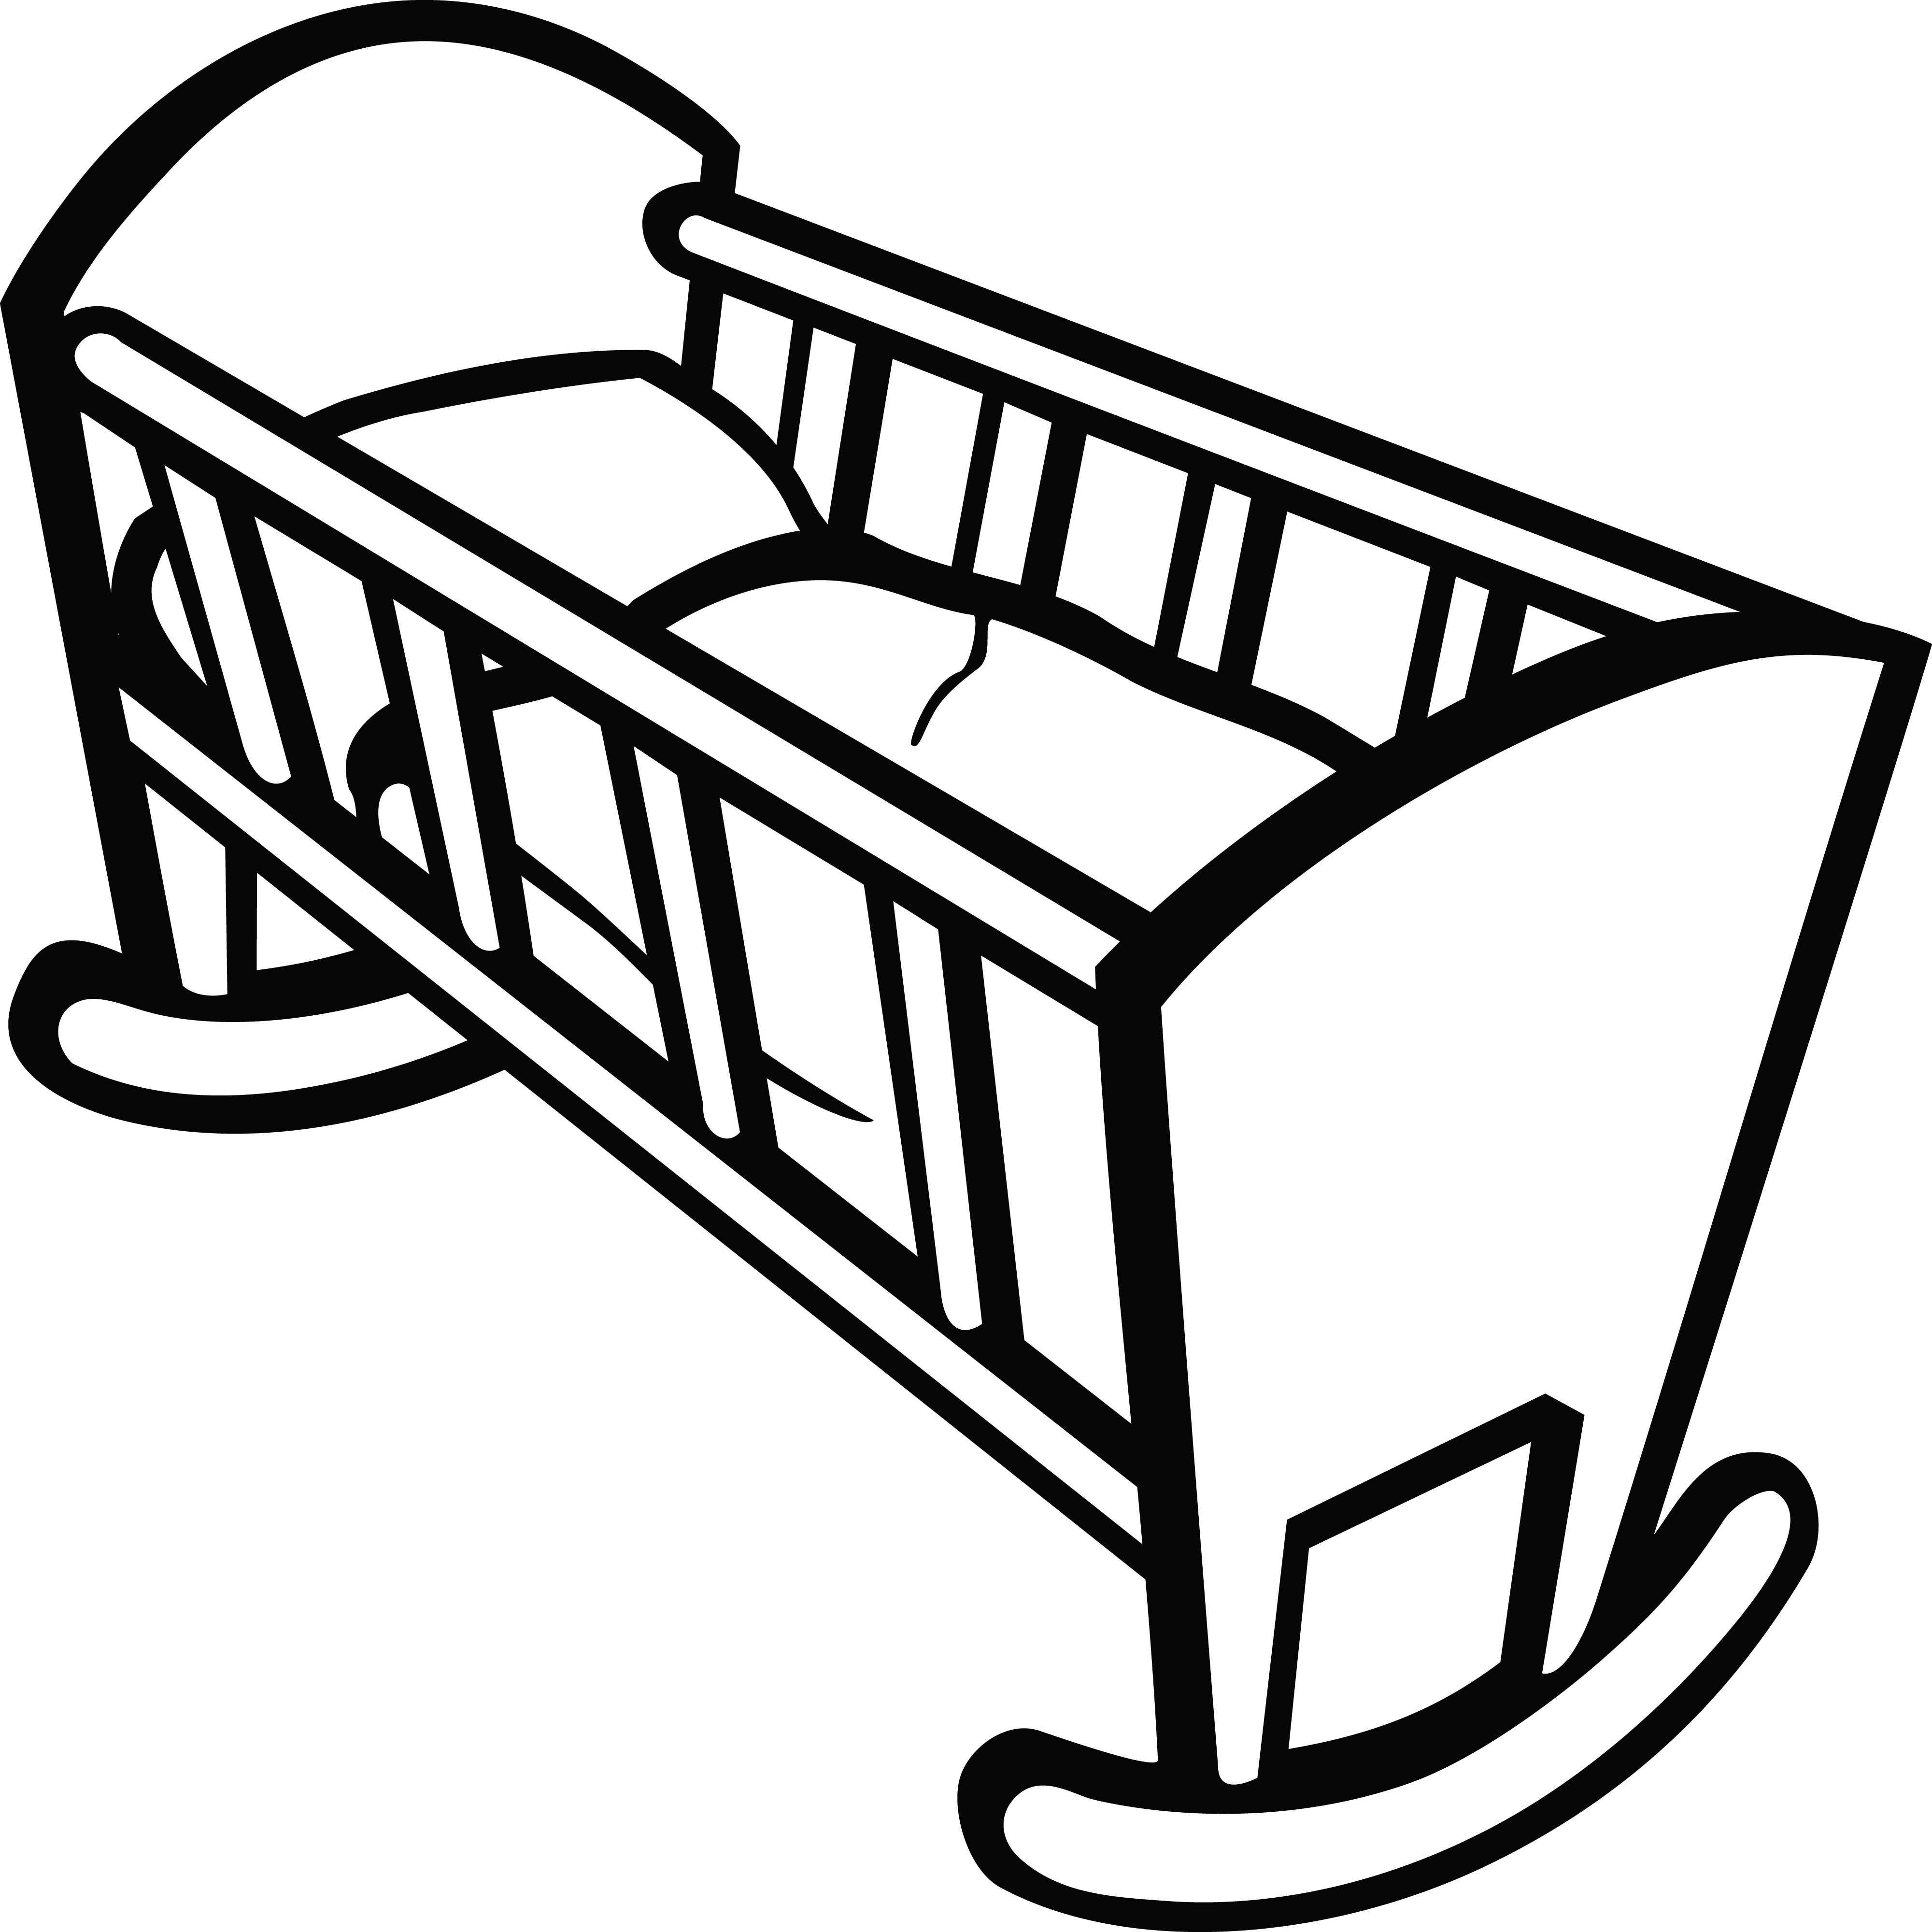 Clipart Of A Baby Crib Con Imagenes